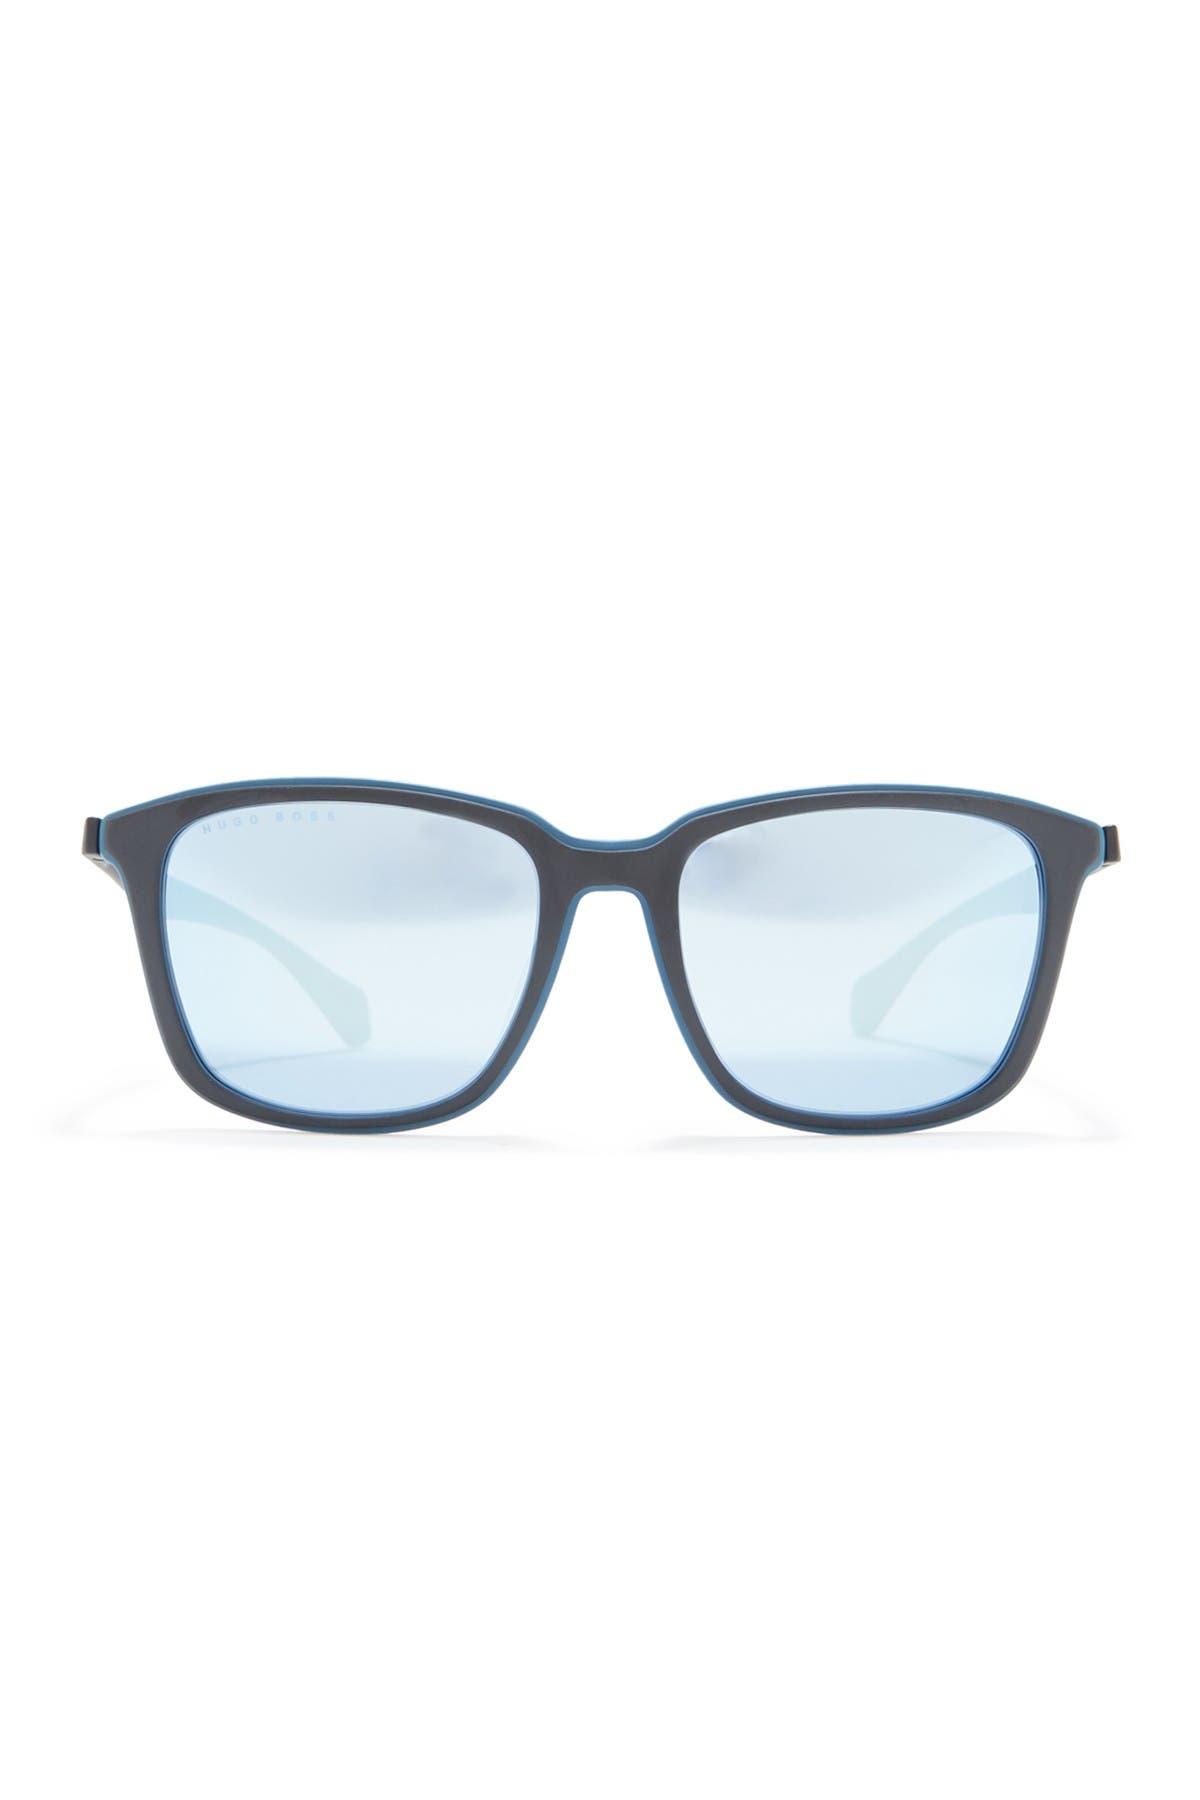 Image of BOSS 56mm Rectangular Sunglasses